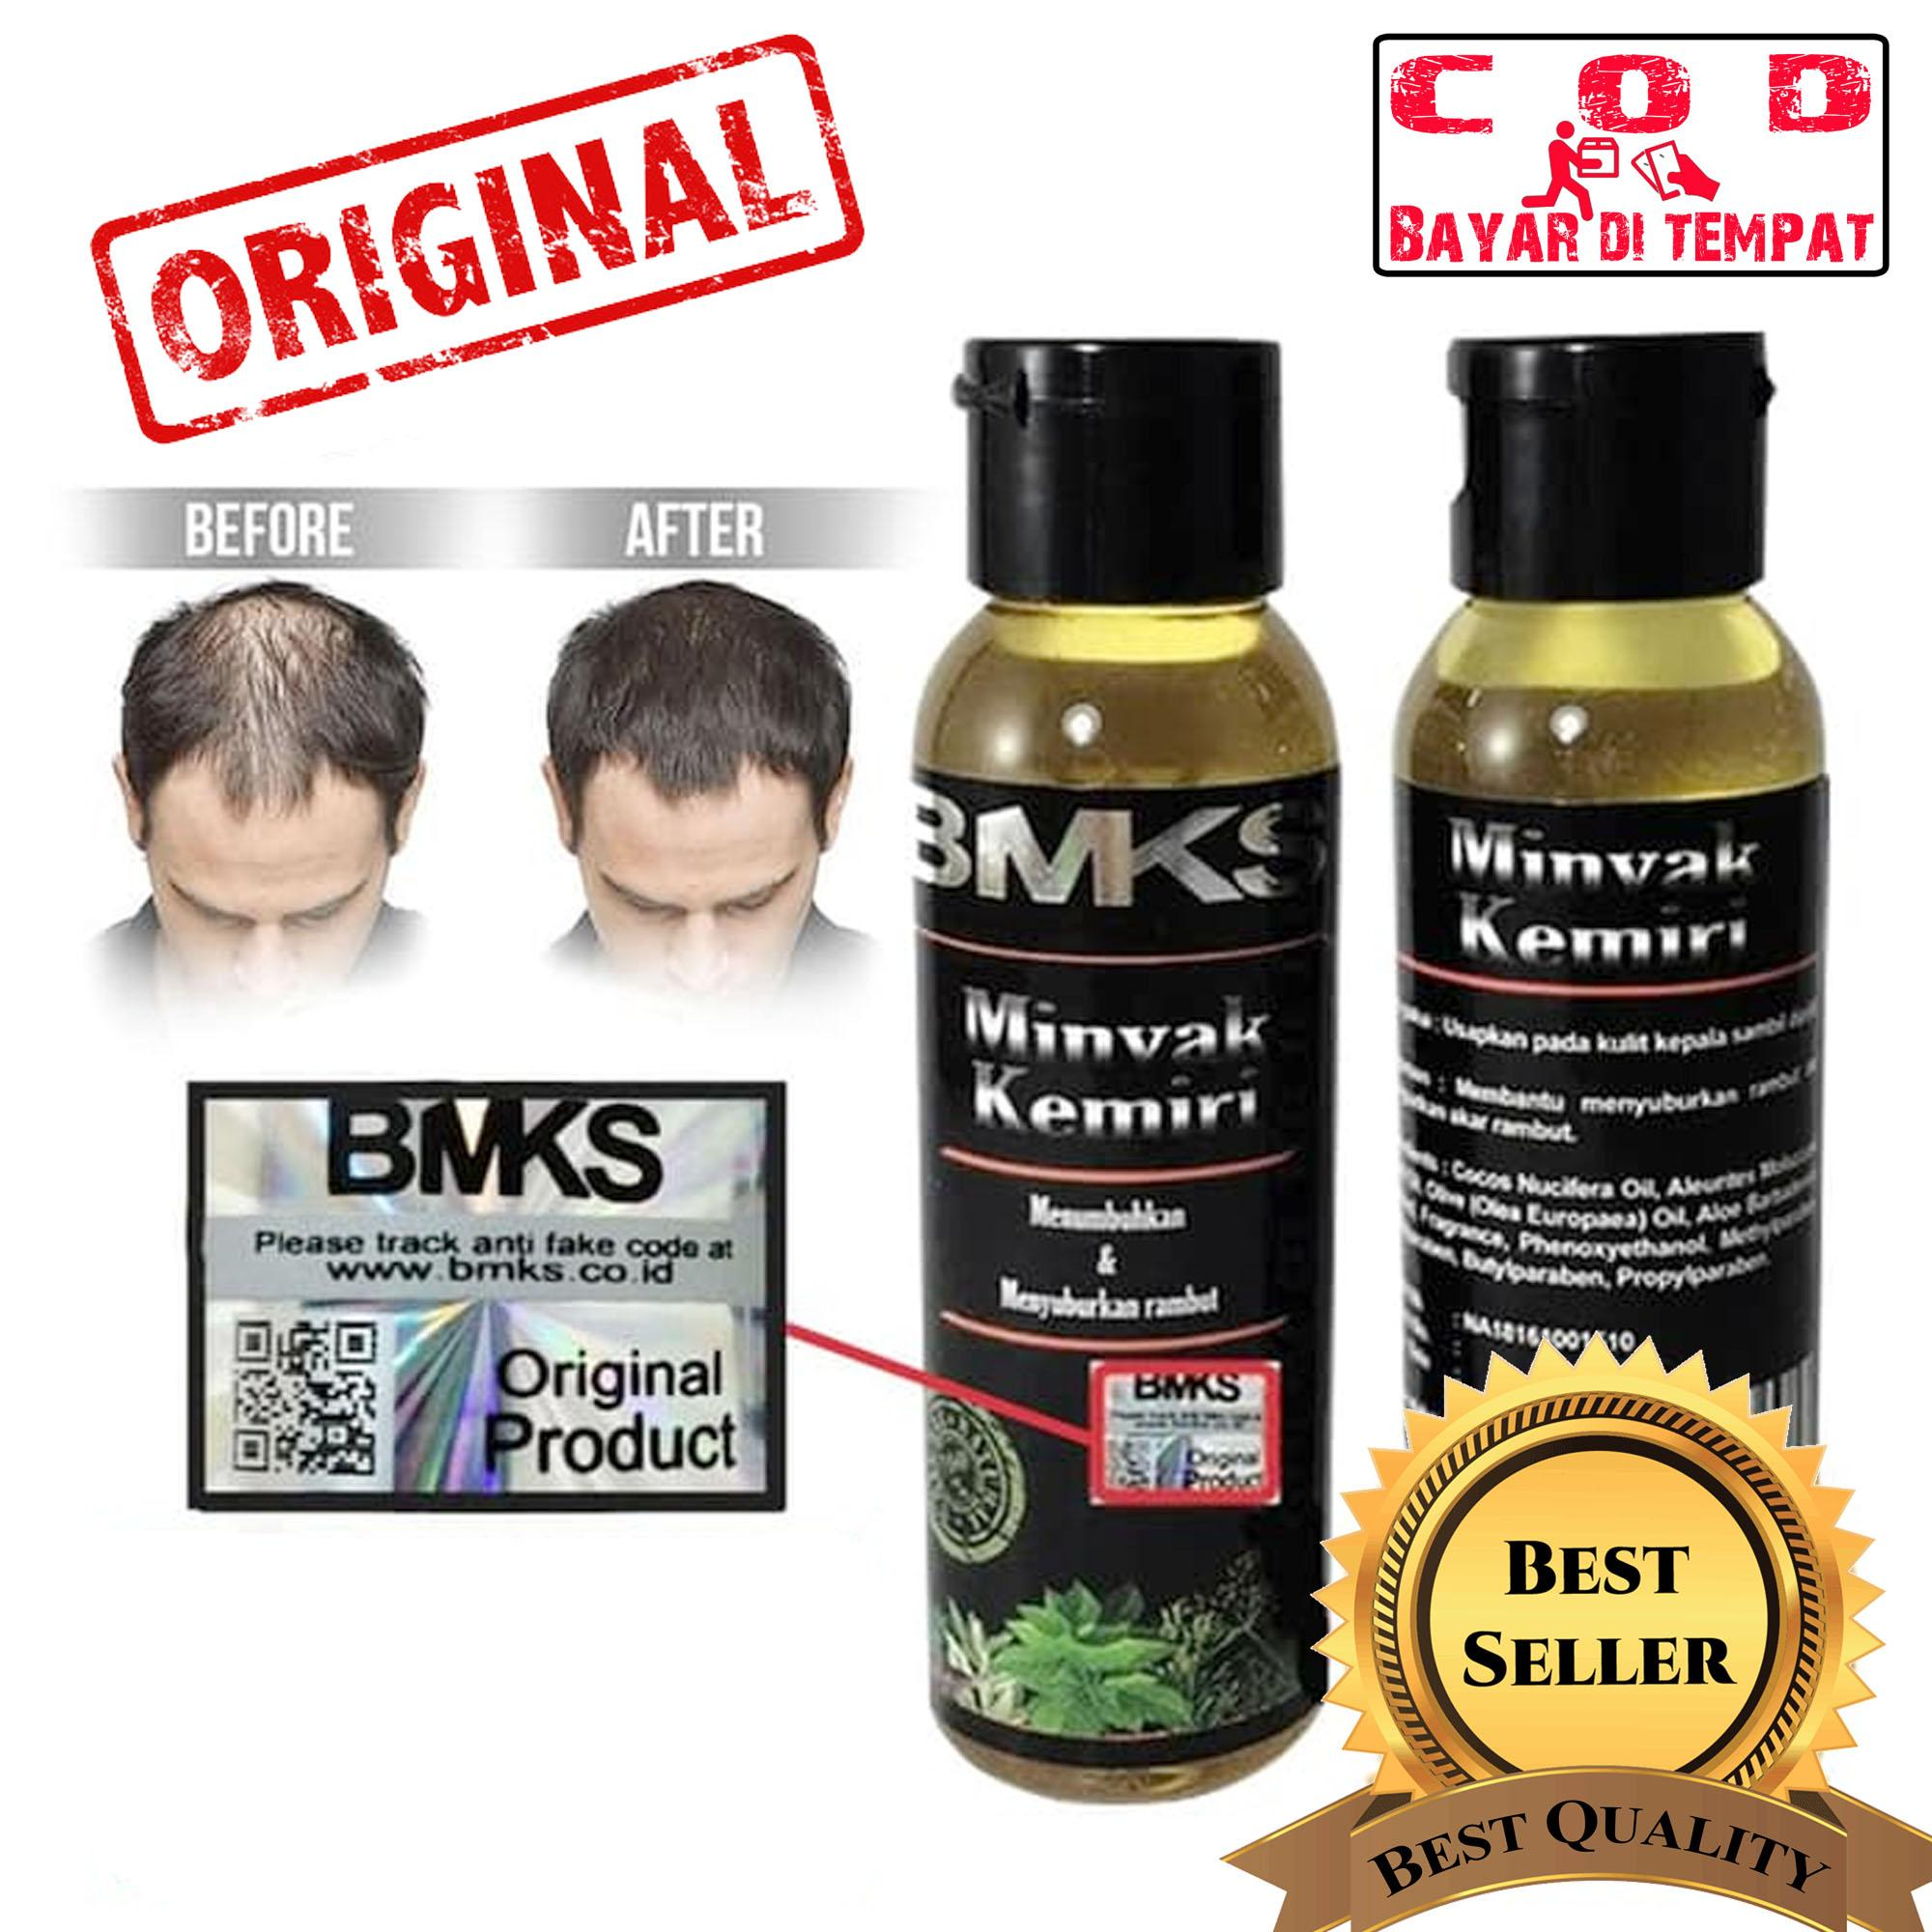 BMKS - Minyak Kemiri Penumbuh Rambut Original 100% Asli Kemiri - ( Minyak Kemiri BPOM